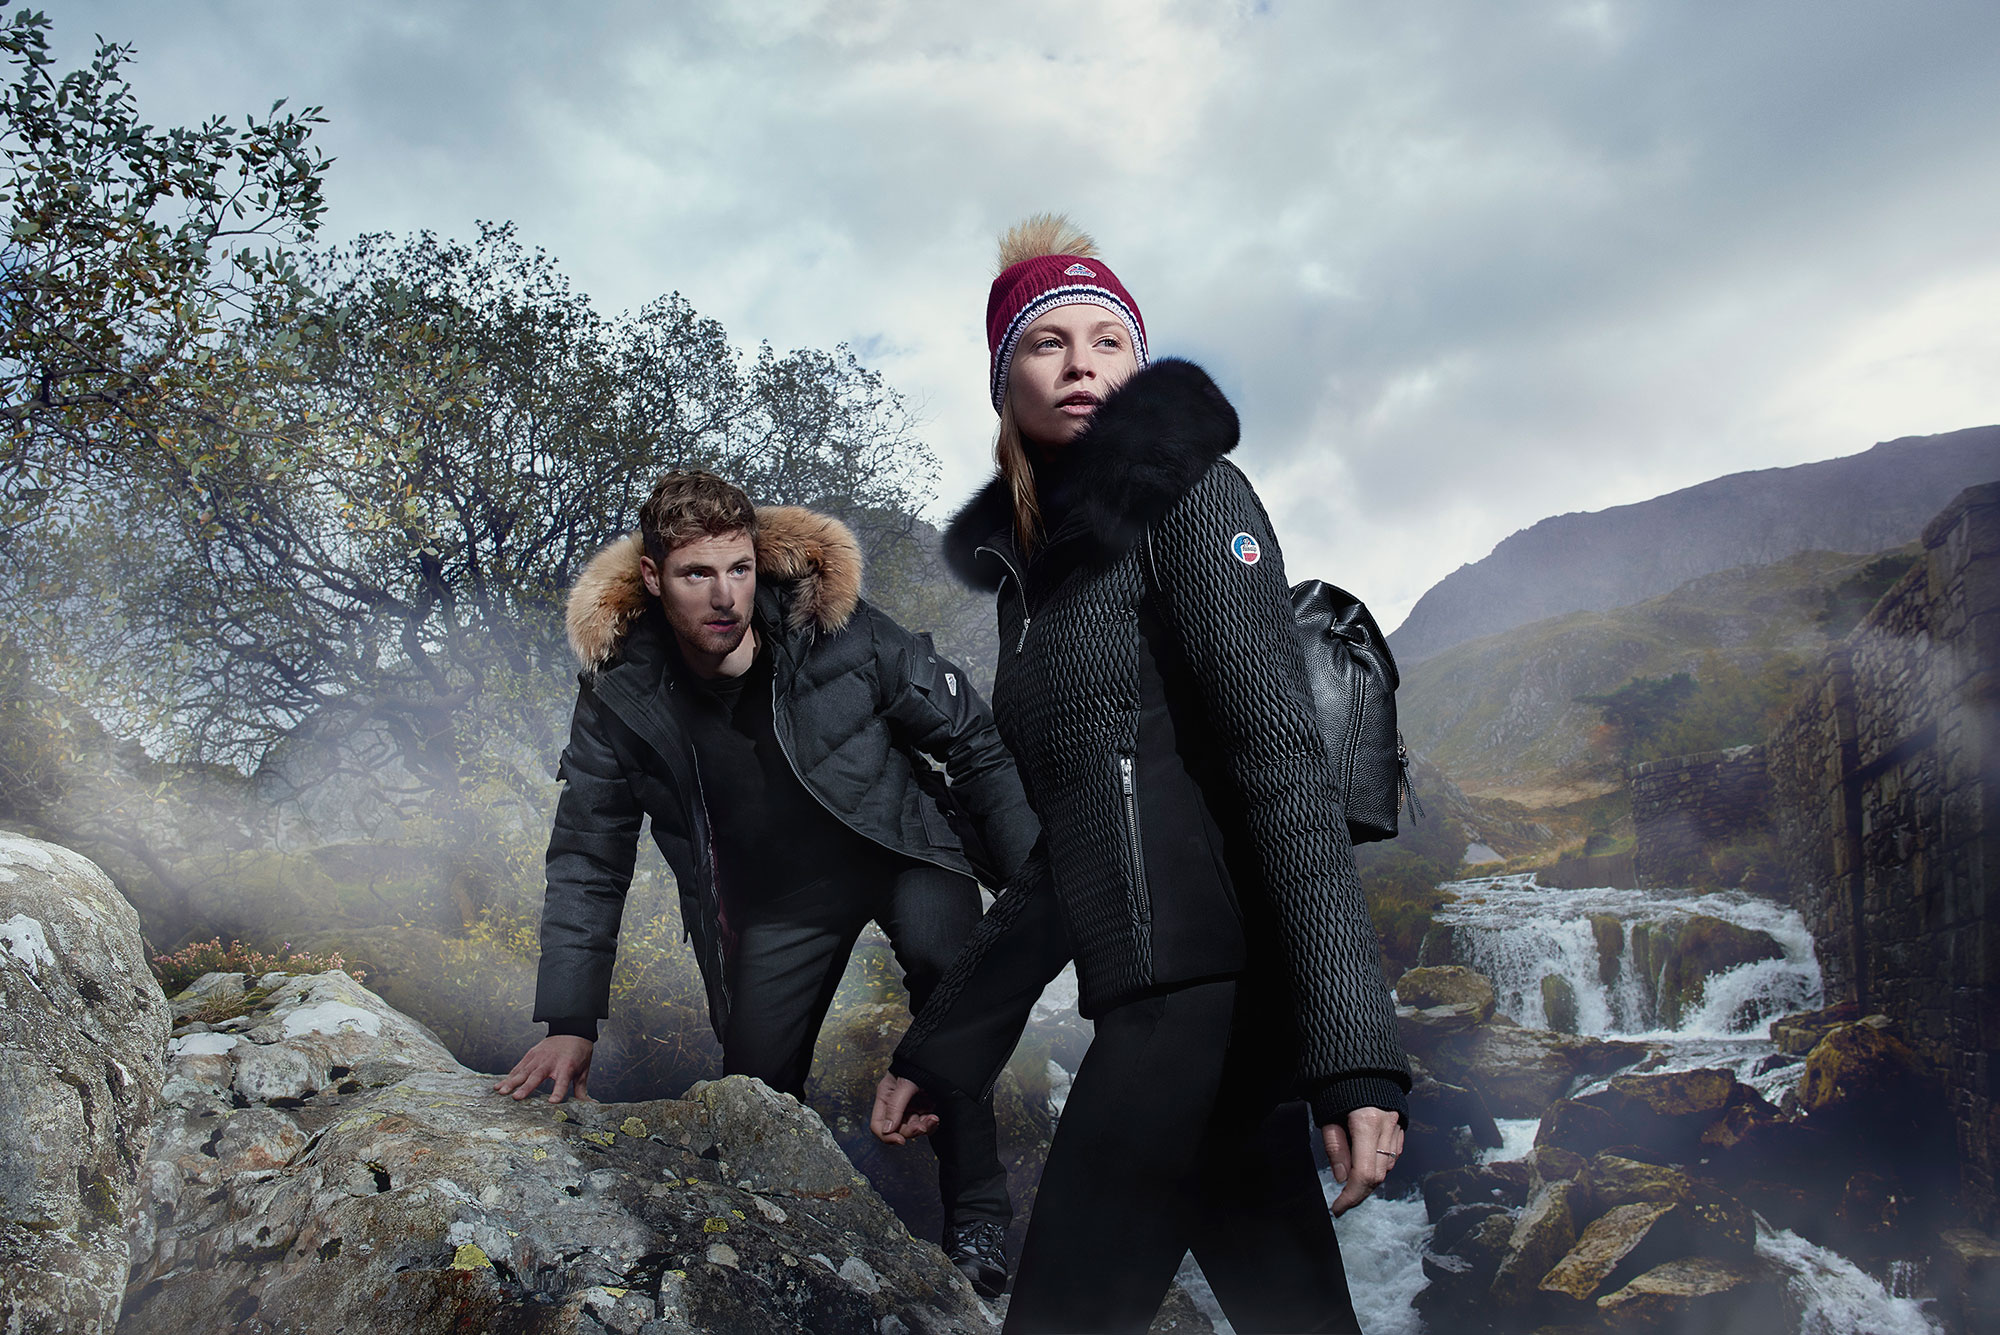 Tessuti-fashion-campaign-couple-black-jackets-2000px-wide